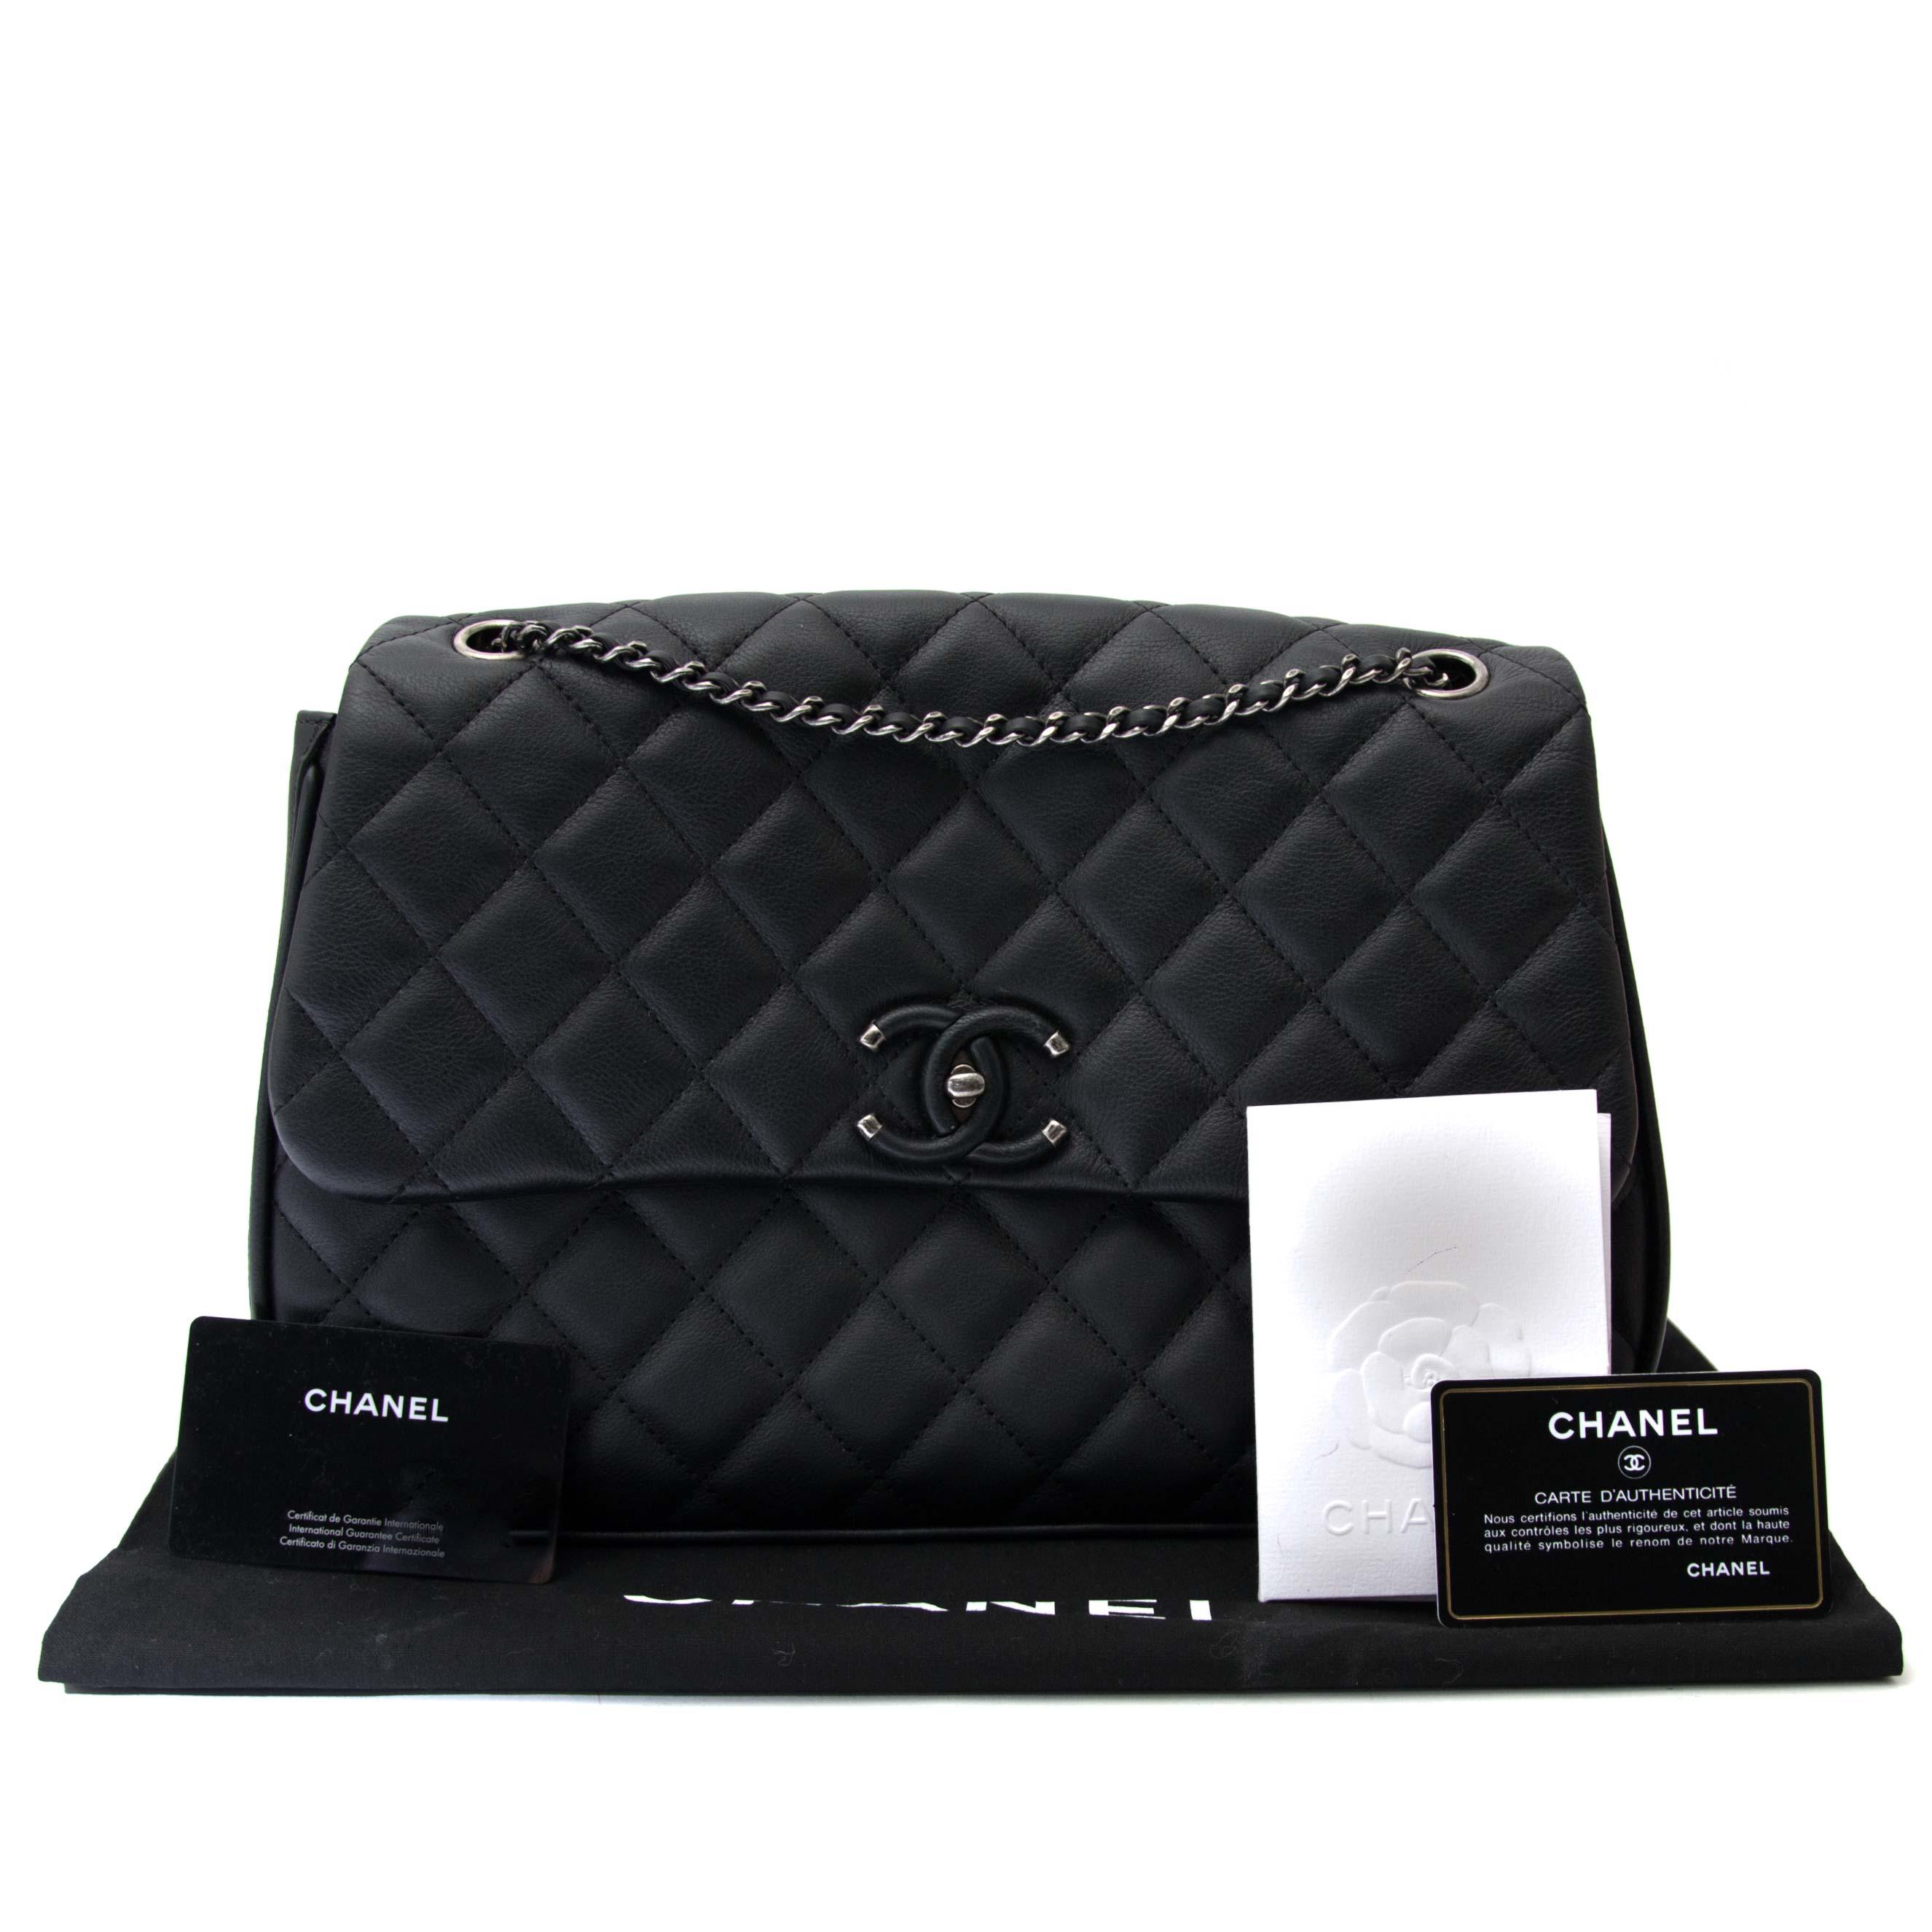 shop veilig online jou tweedehands shop online at the best price your secondhand Chanel Quilted Calfskin Flap Bag